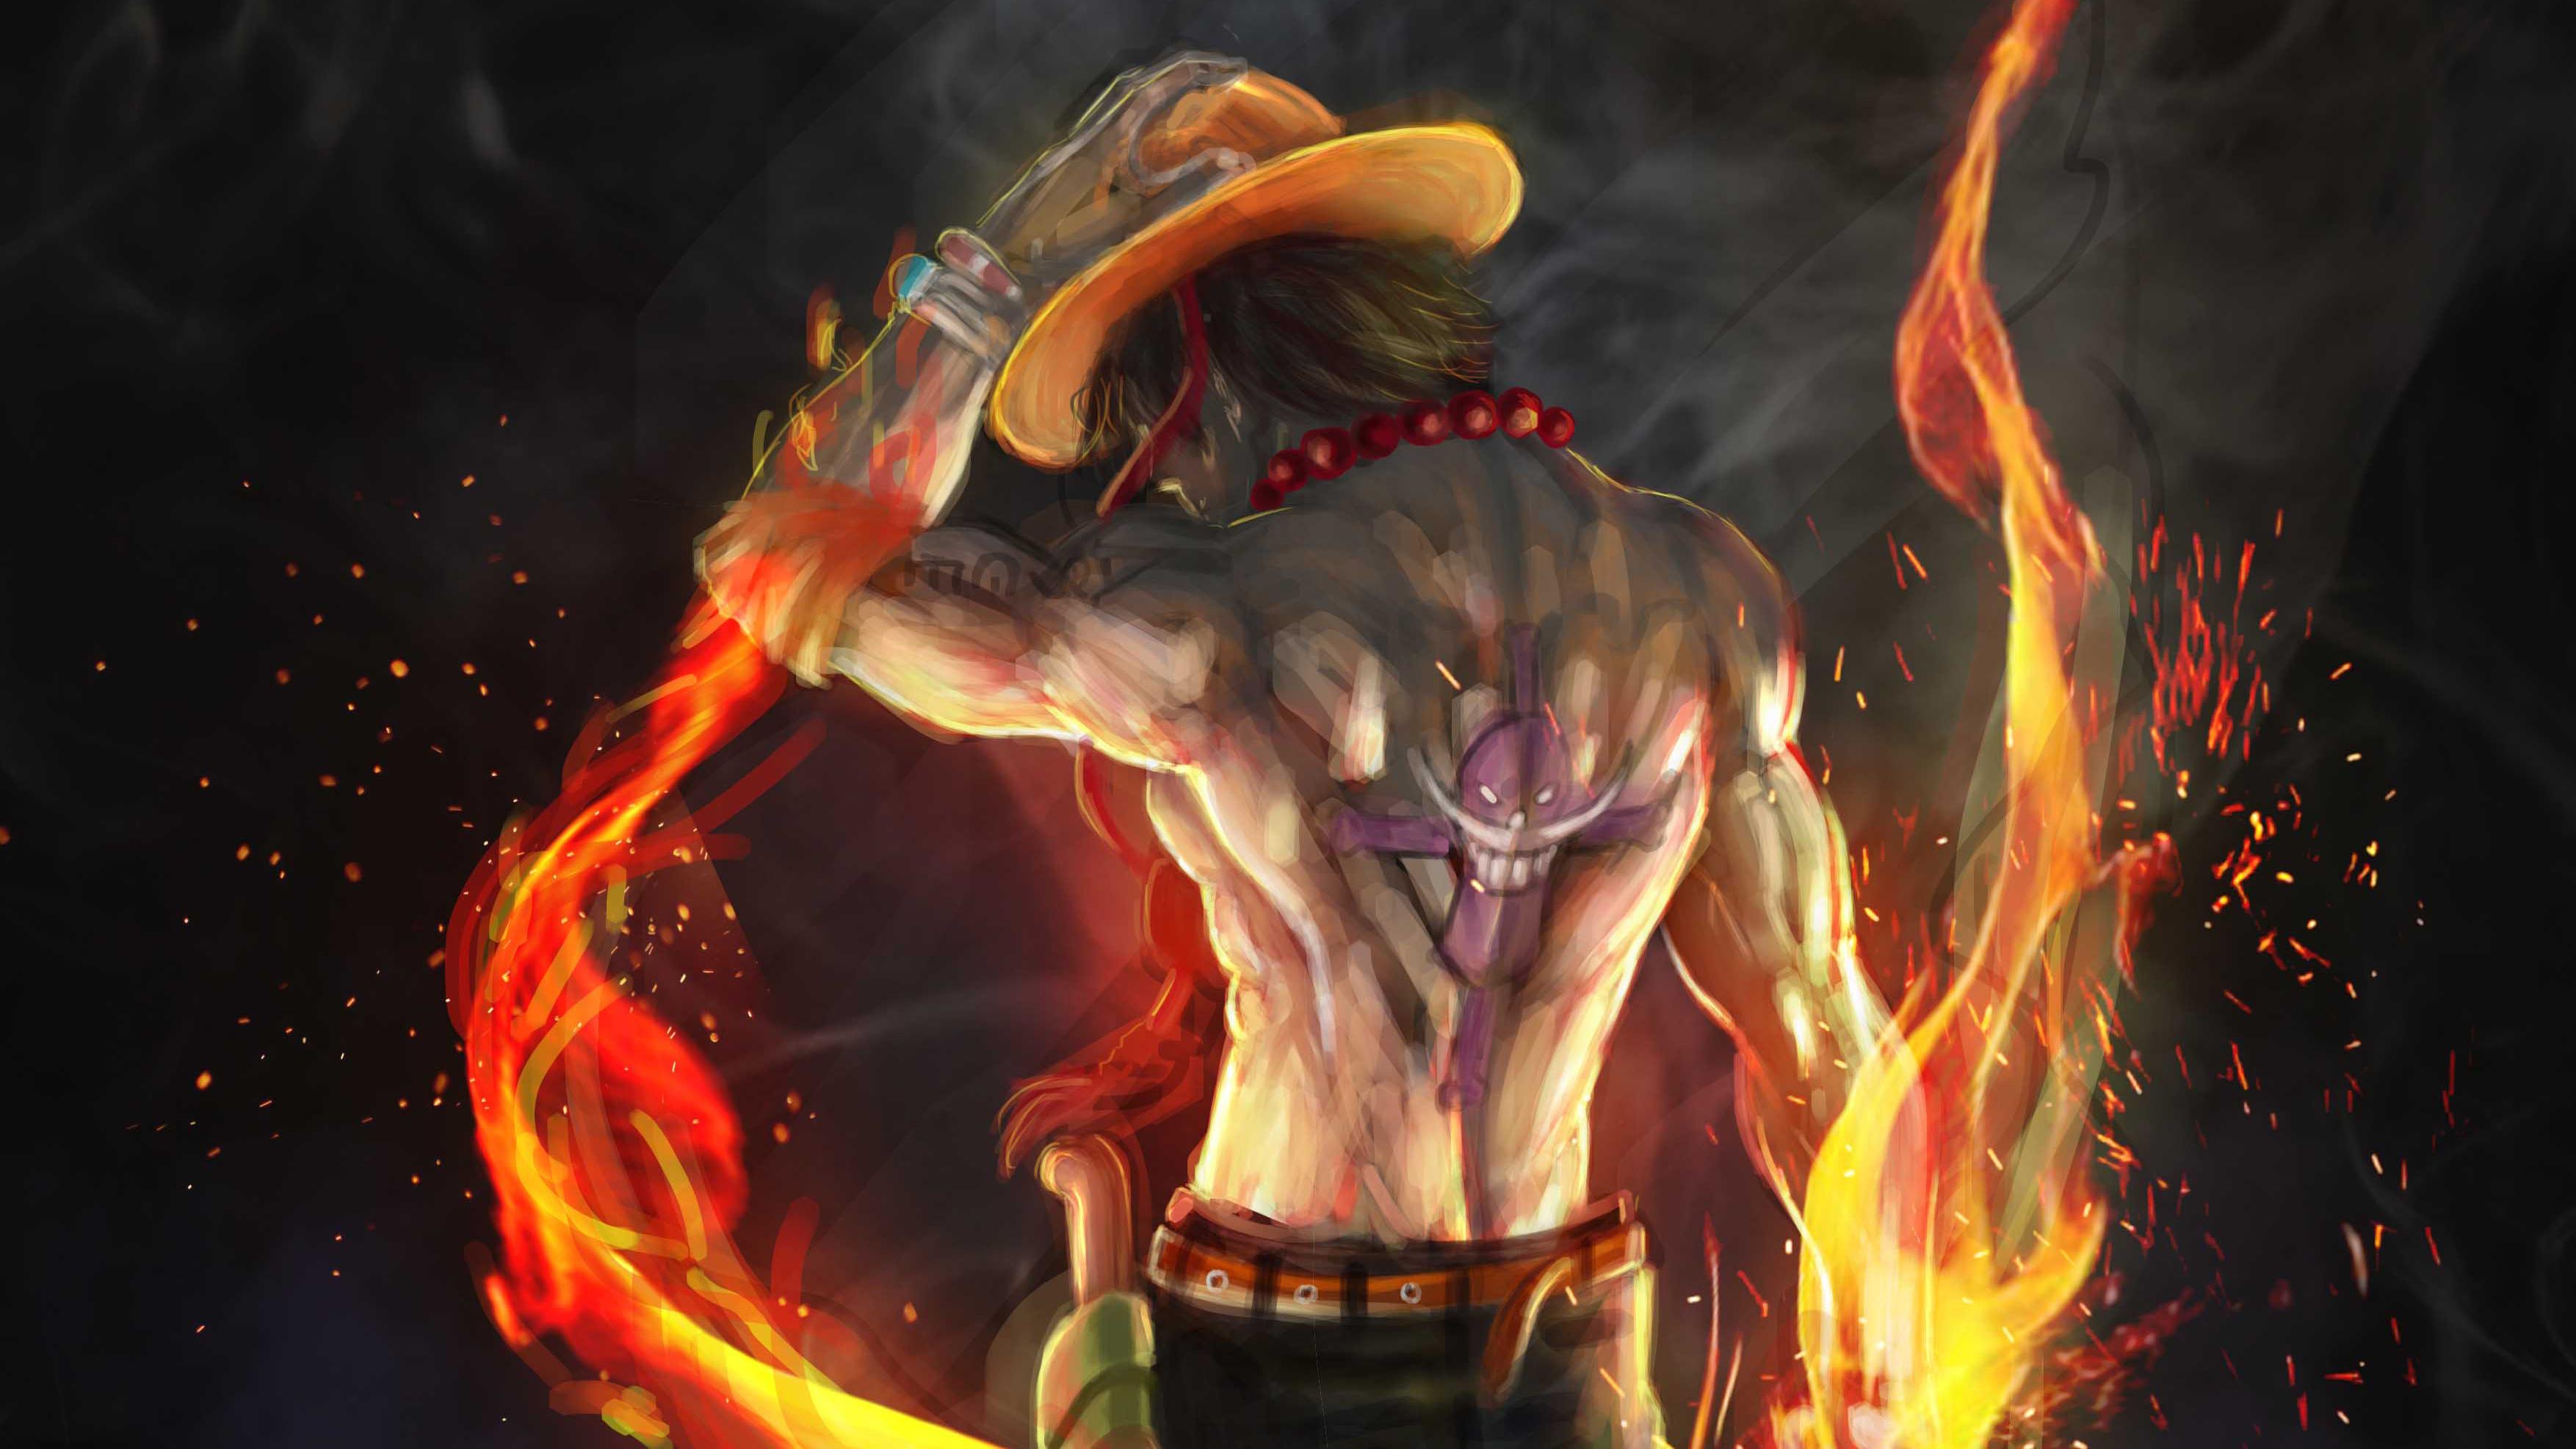 Fire Fist Ace 4k Artwork, HD Artist, 4k Wallpapers, Images